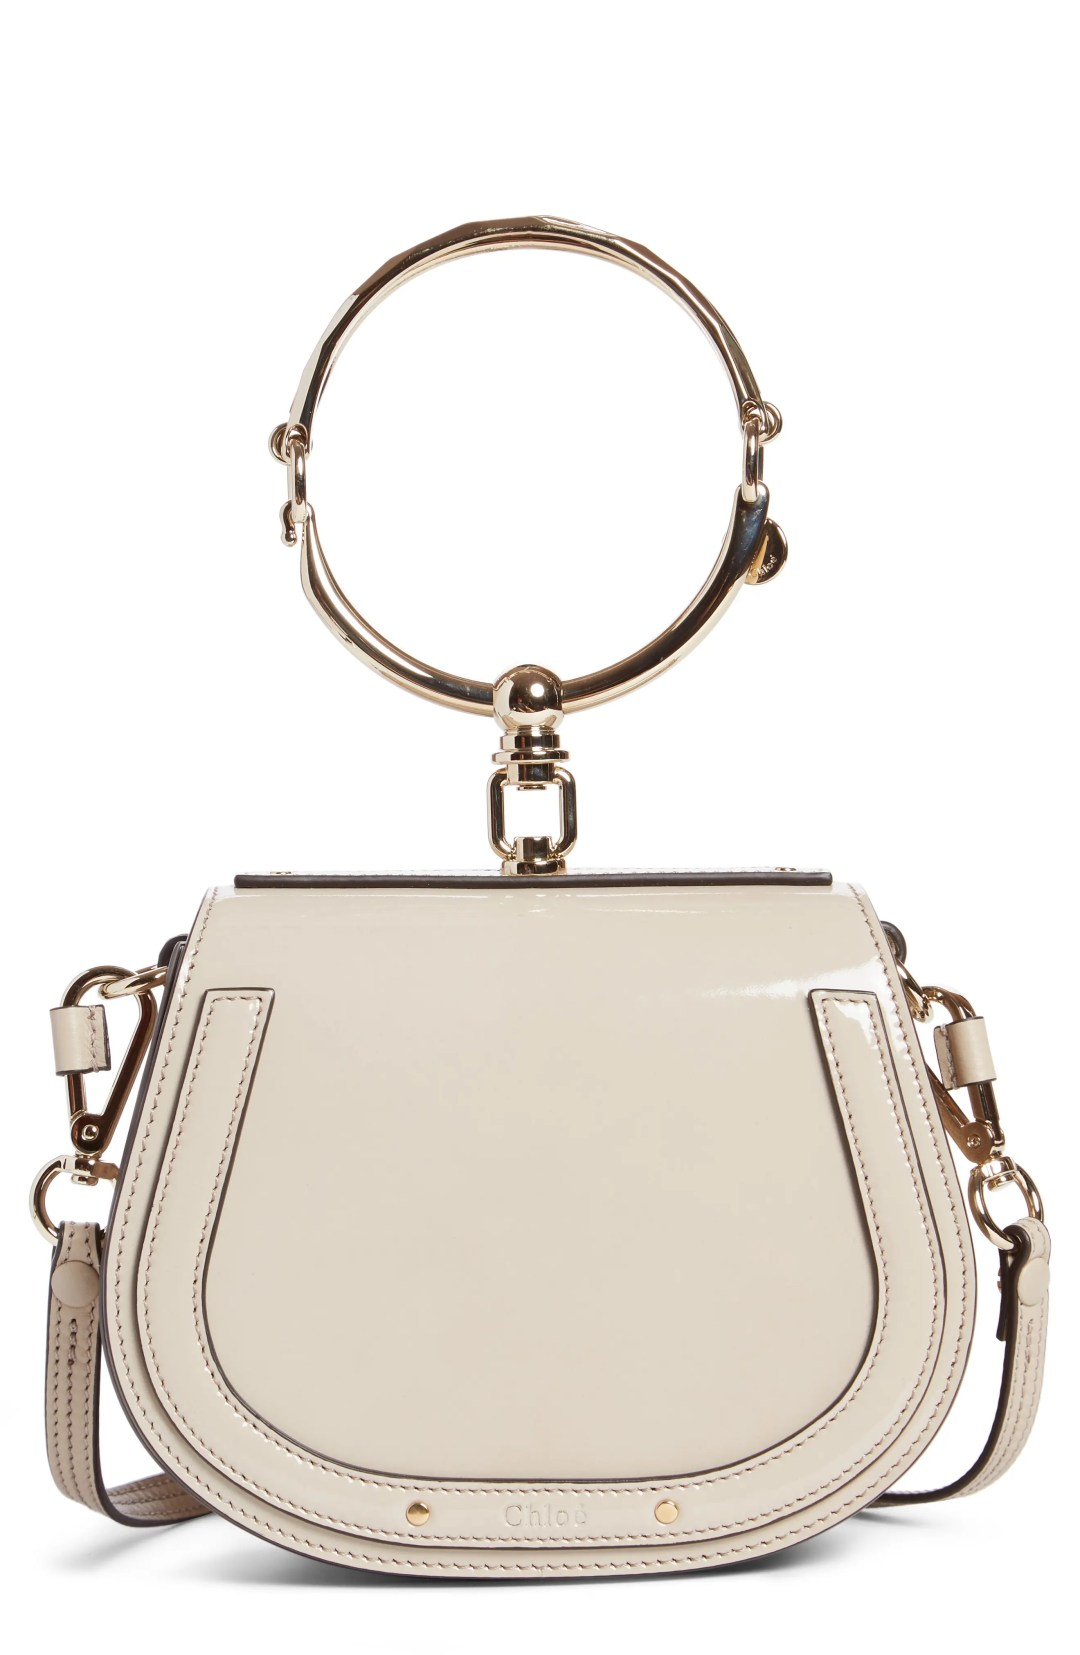 Chloé Small Nile Leather Shoulder Crossbody Bag f9198915af3f8